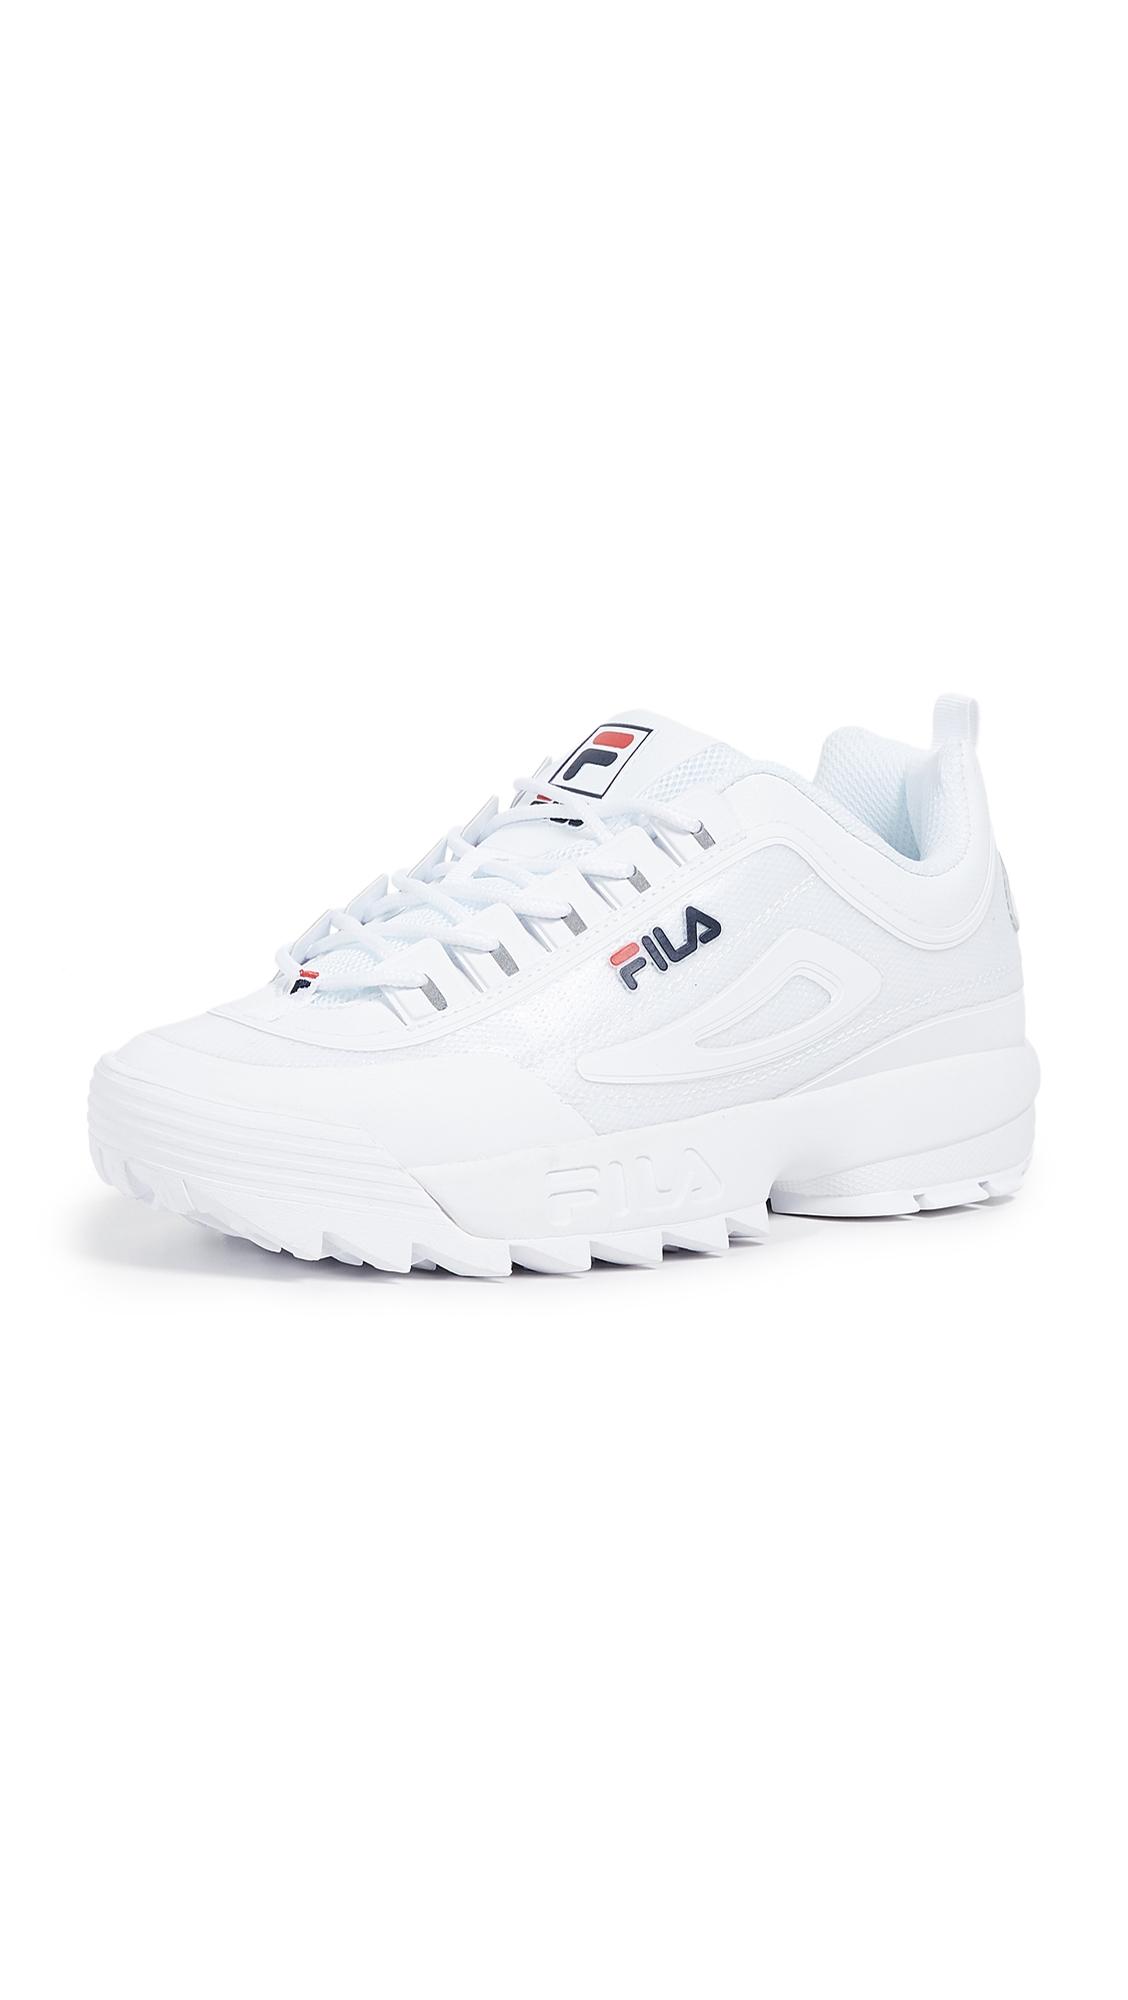 Fila Sneakers DISRUPTOR II SNEAKERS